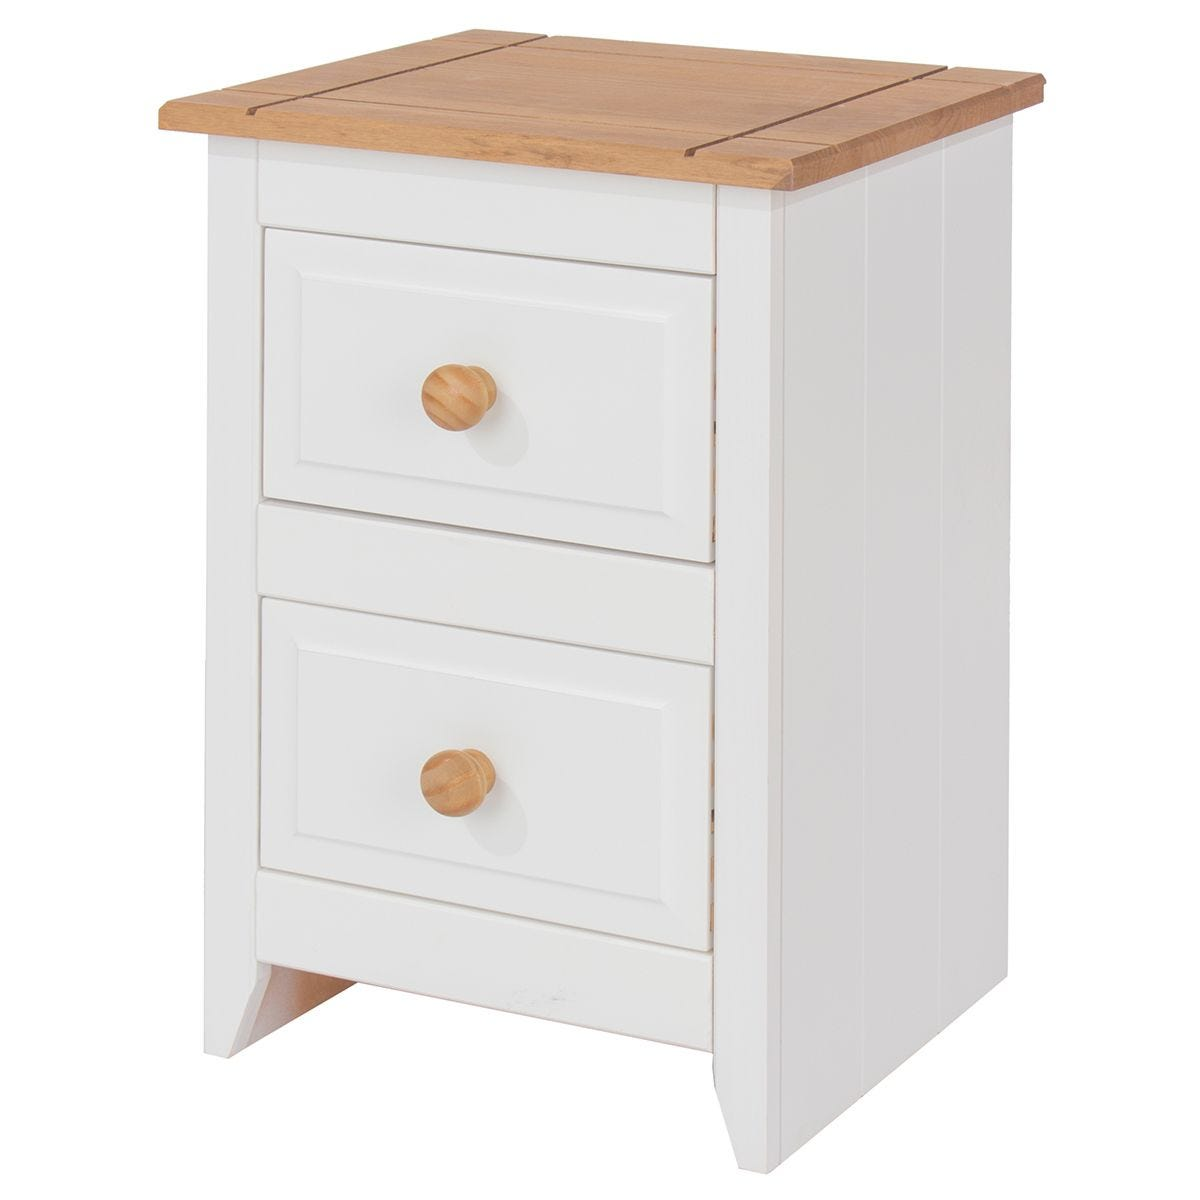 Felka 2 Drawer Petite Bedside